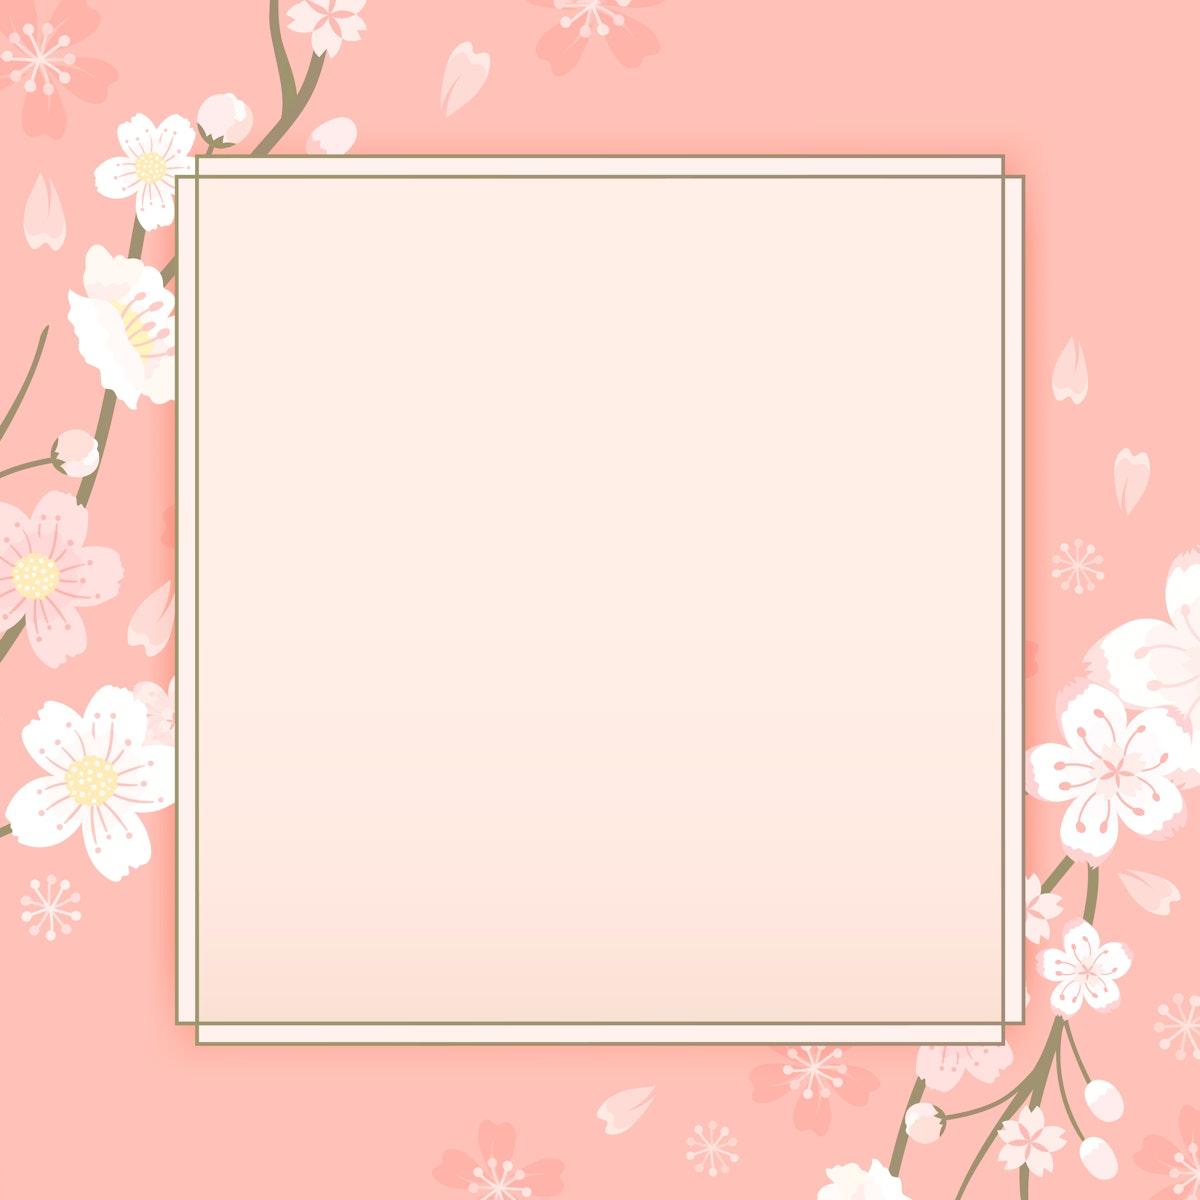 Pink cherry blossom framed vector